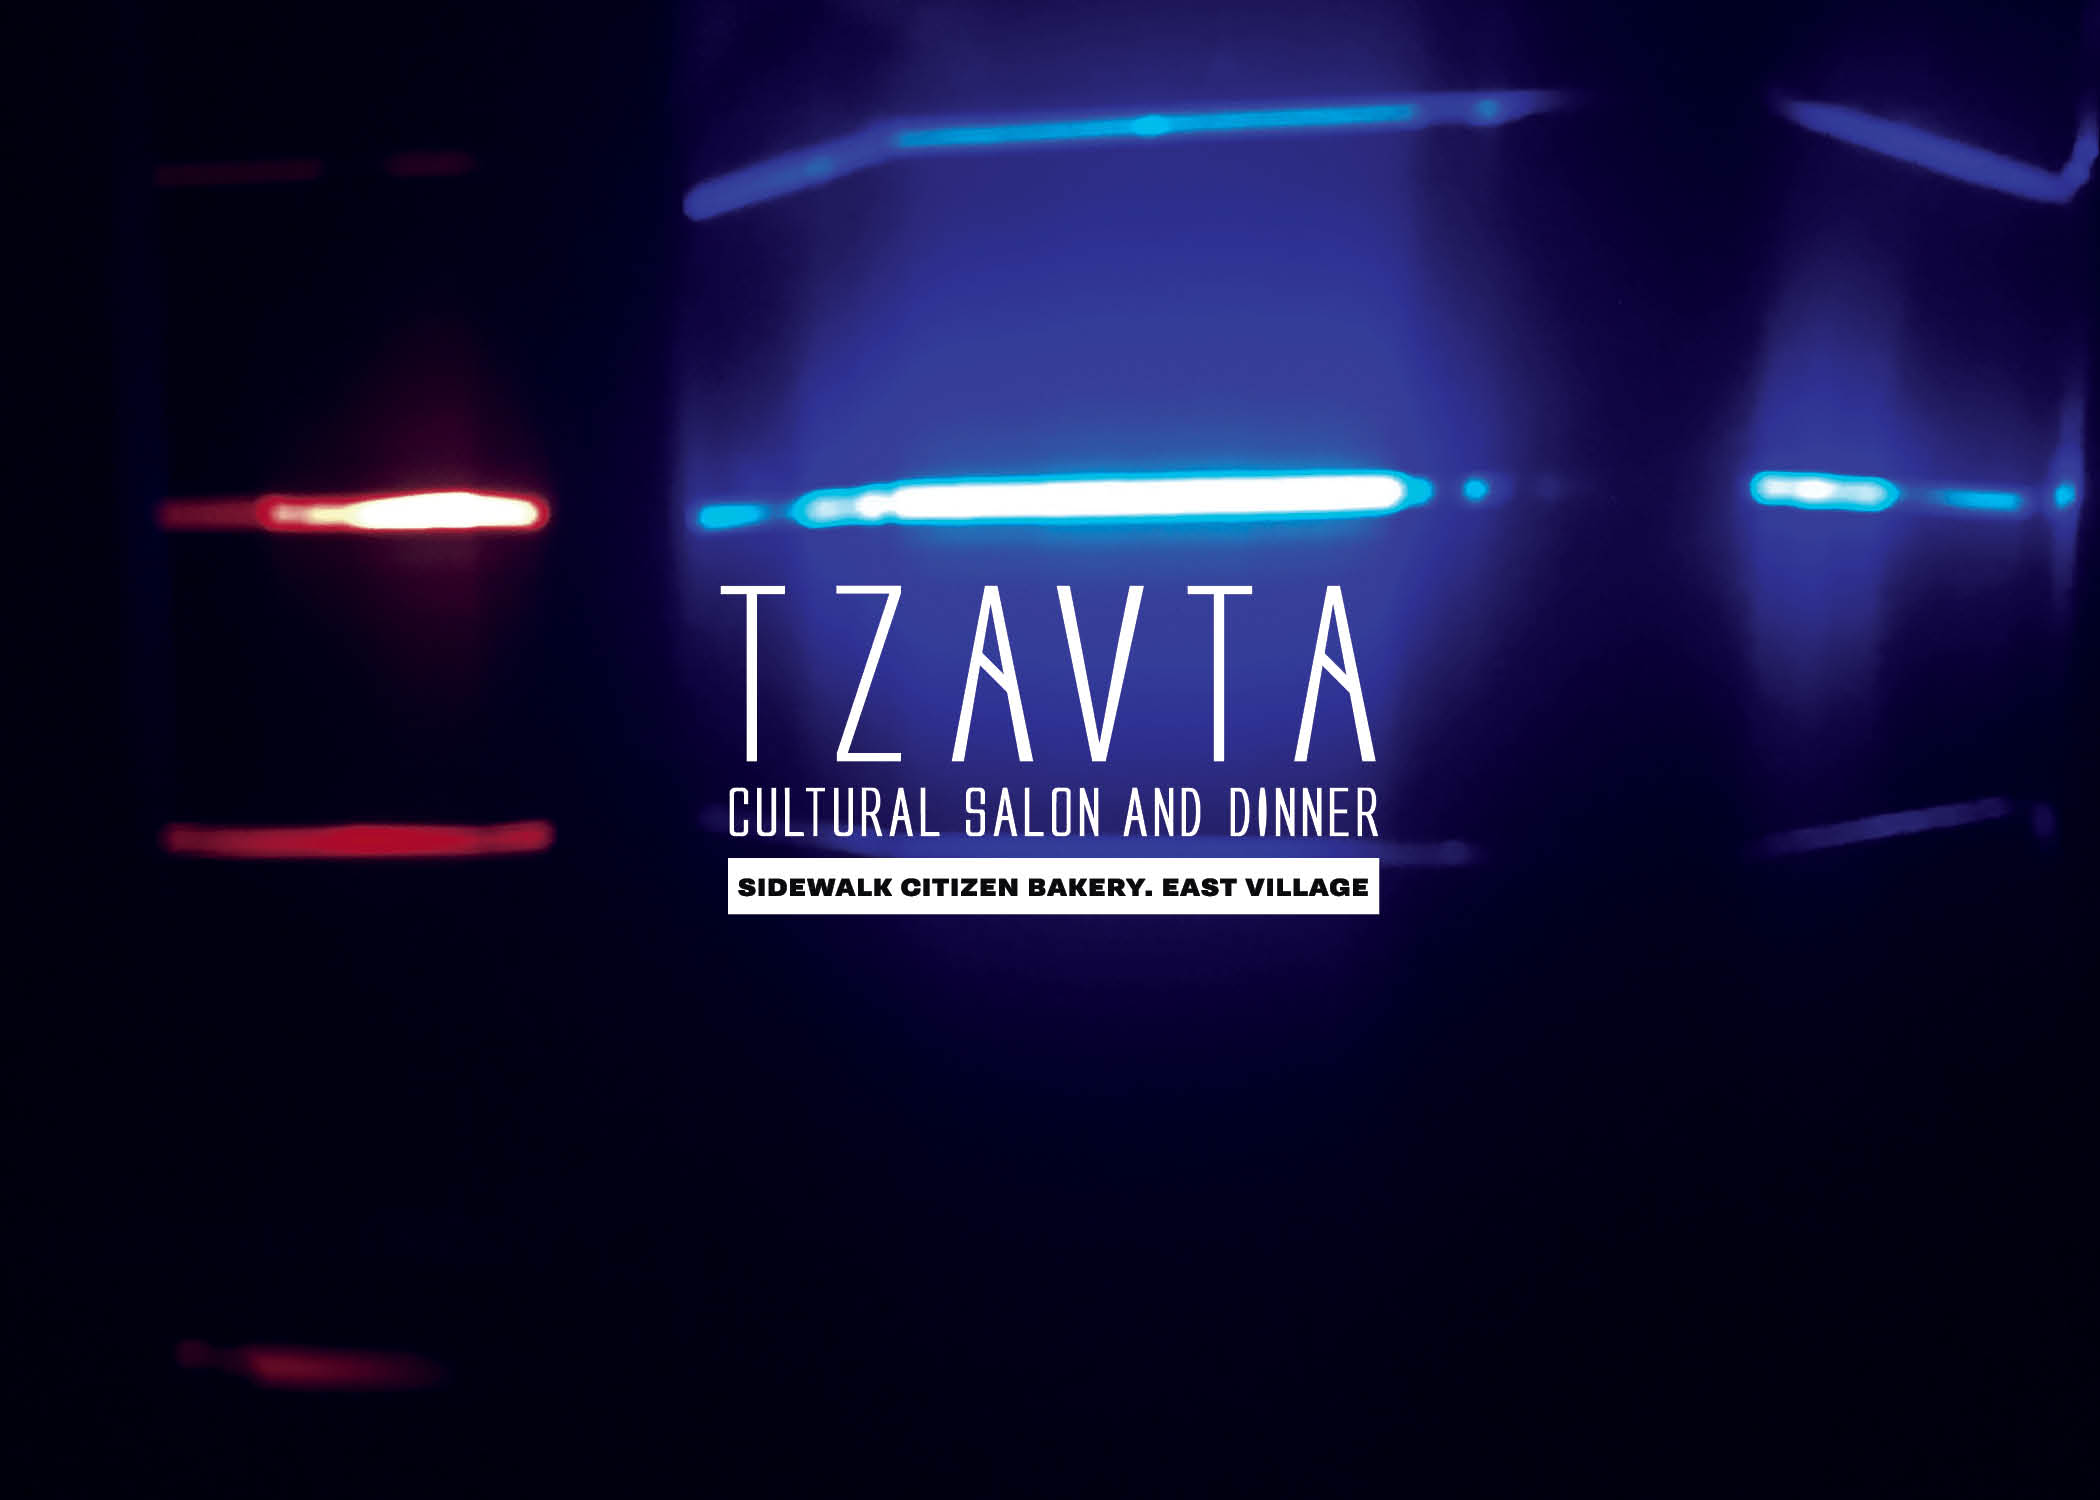 TZAVTA #5